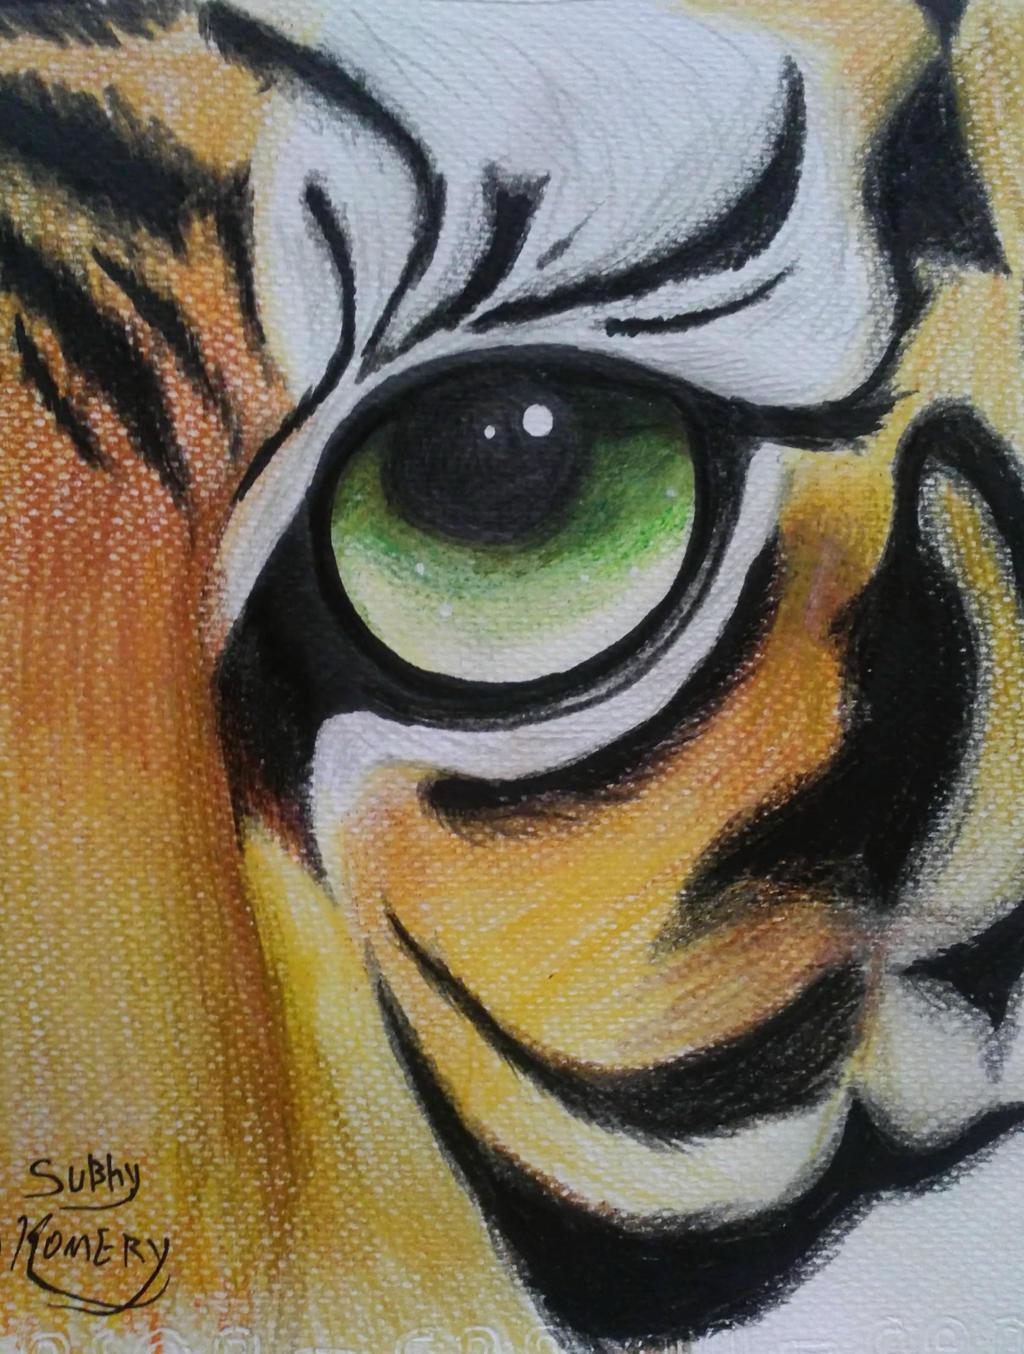 lsu tigers wallpaper free download